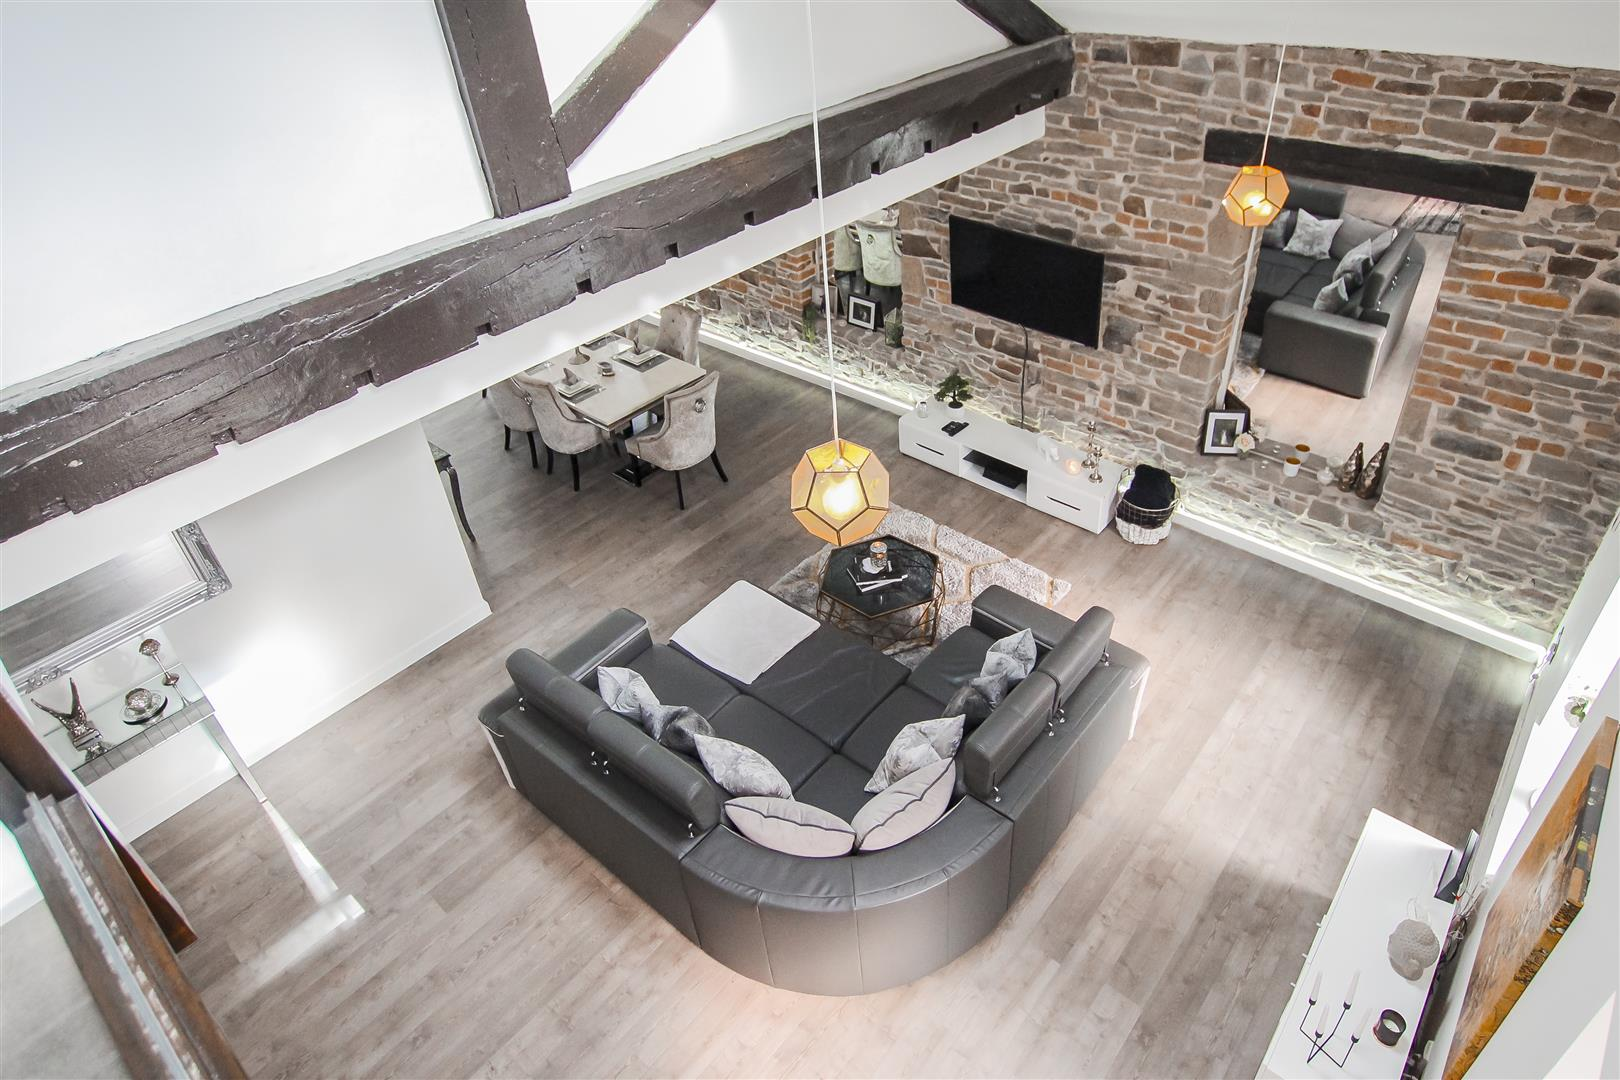 3 Bedroom Duplex Apartment For Sale - Image 42